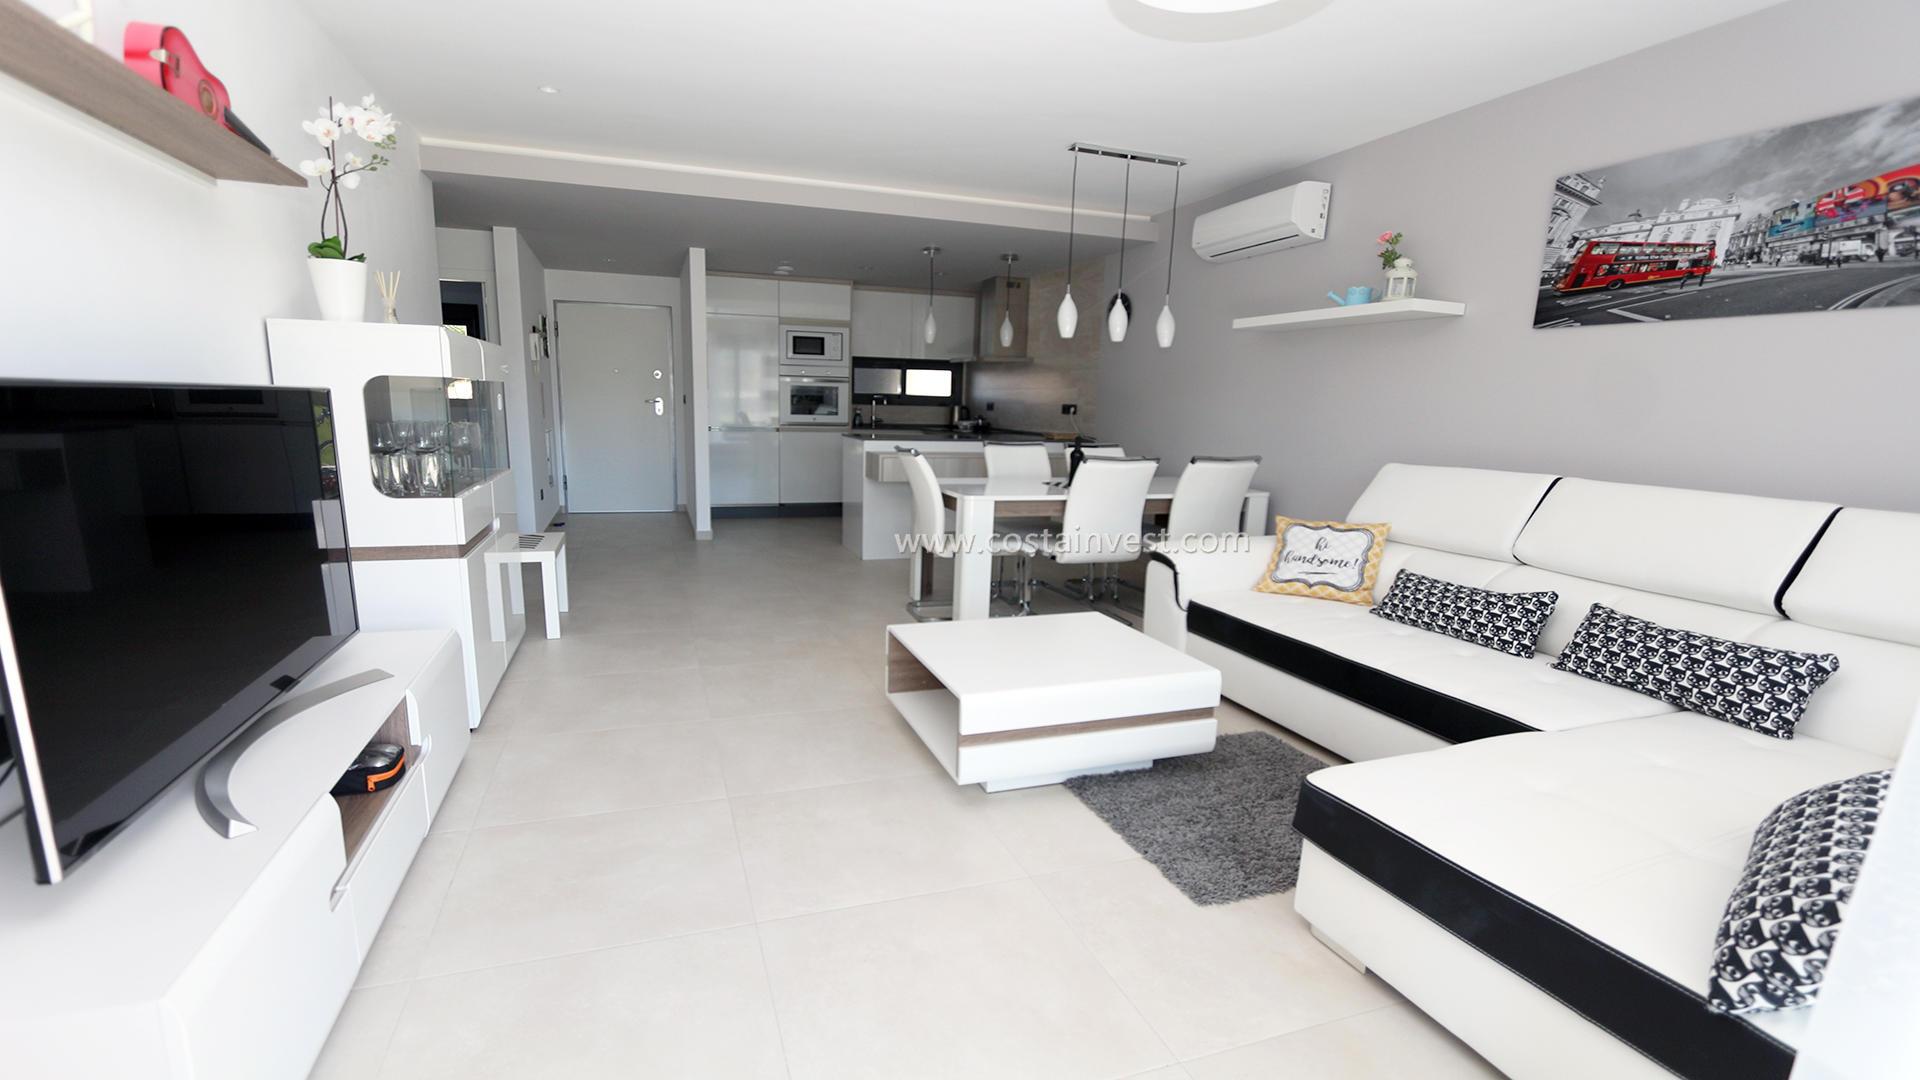 Bungalow -                                       Guardamar Del Segura -                                       3 chambres -                                       6 occupants